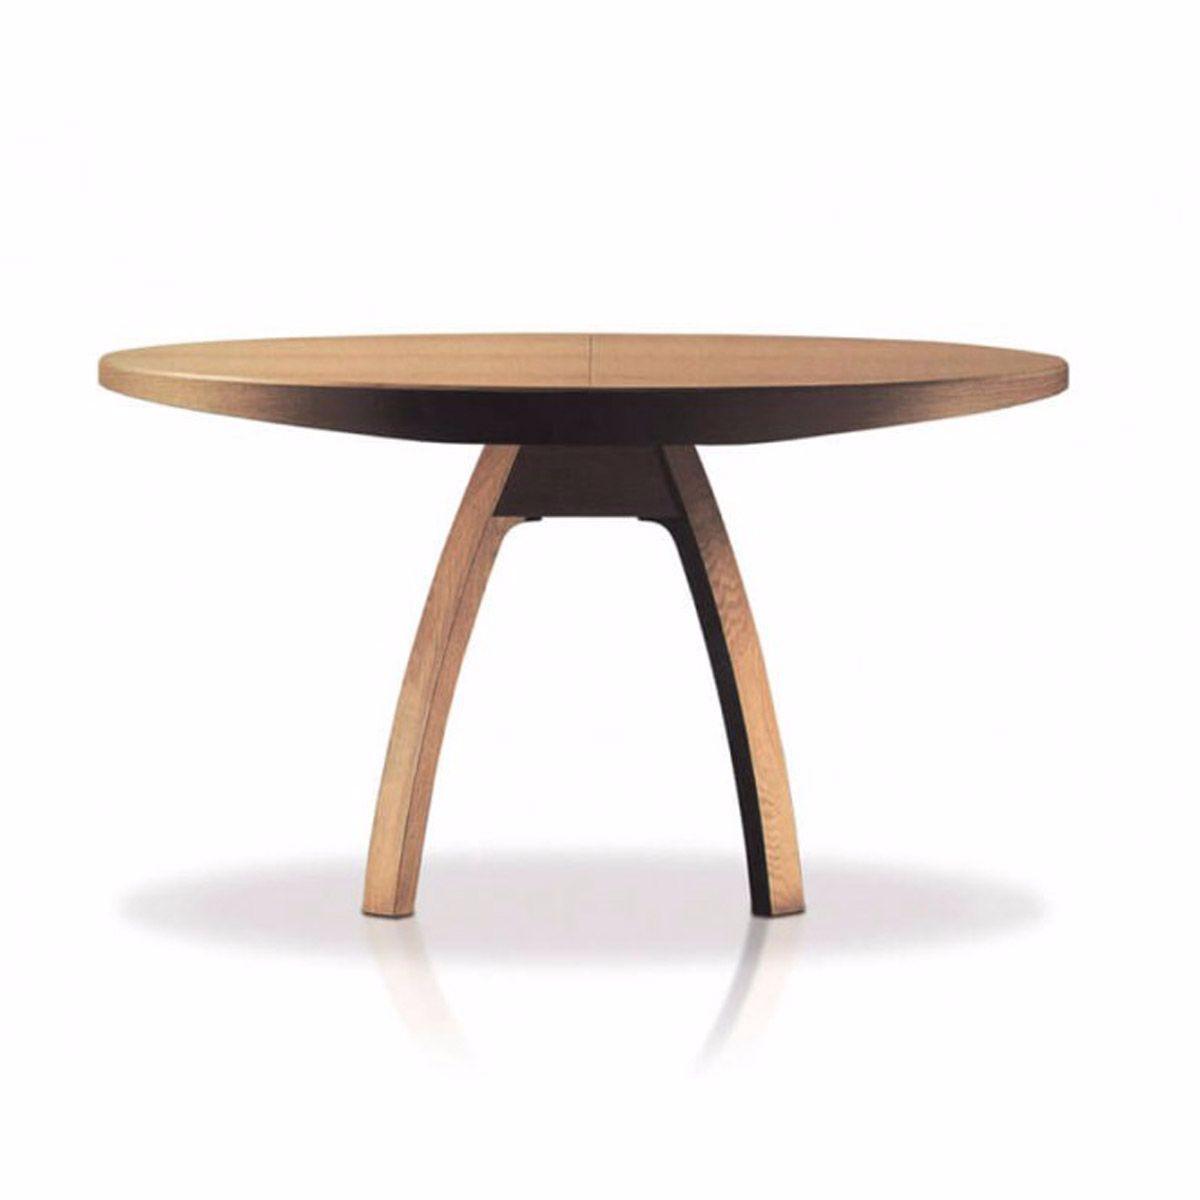 Bramante table - design Enrico Tonucci - Estel | Furniture | Pinterest